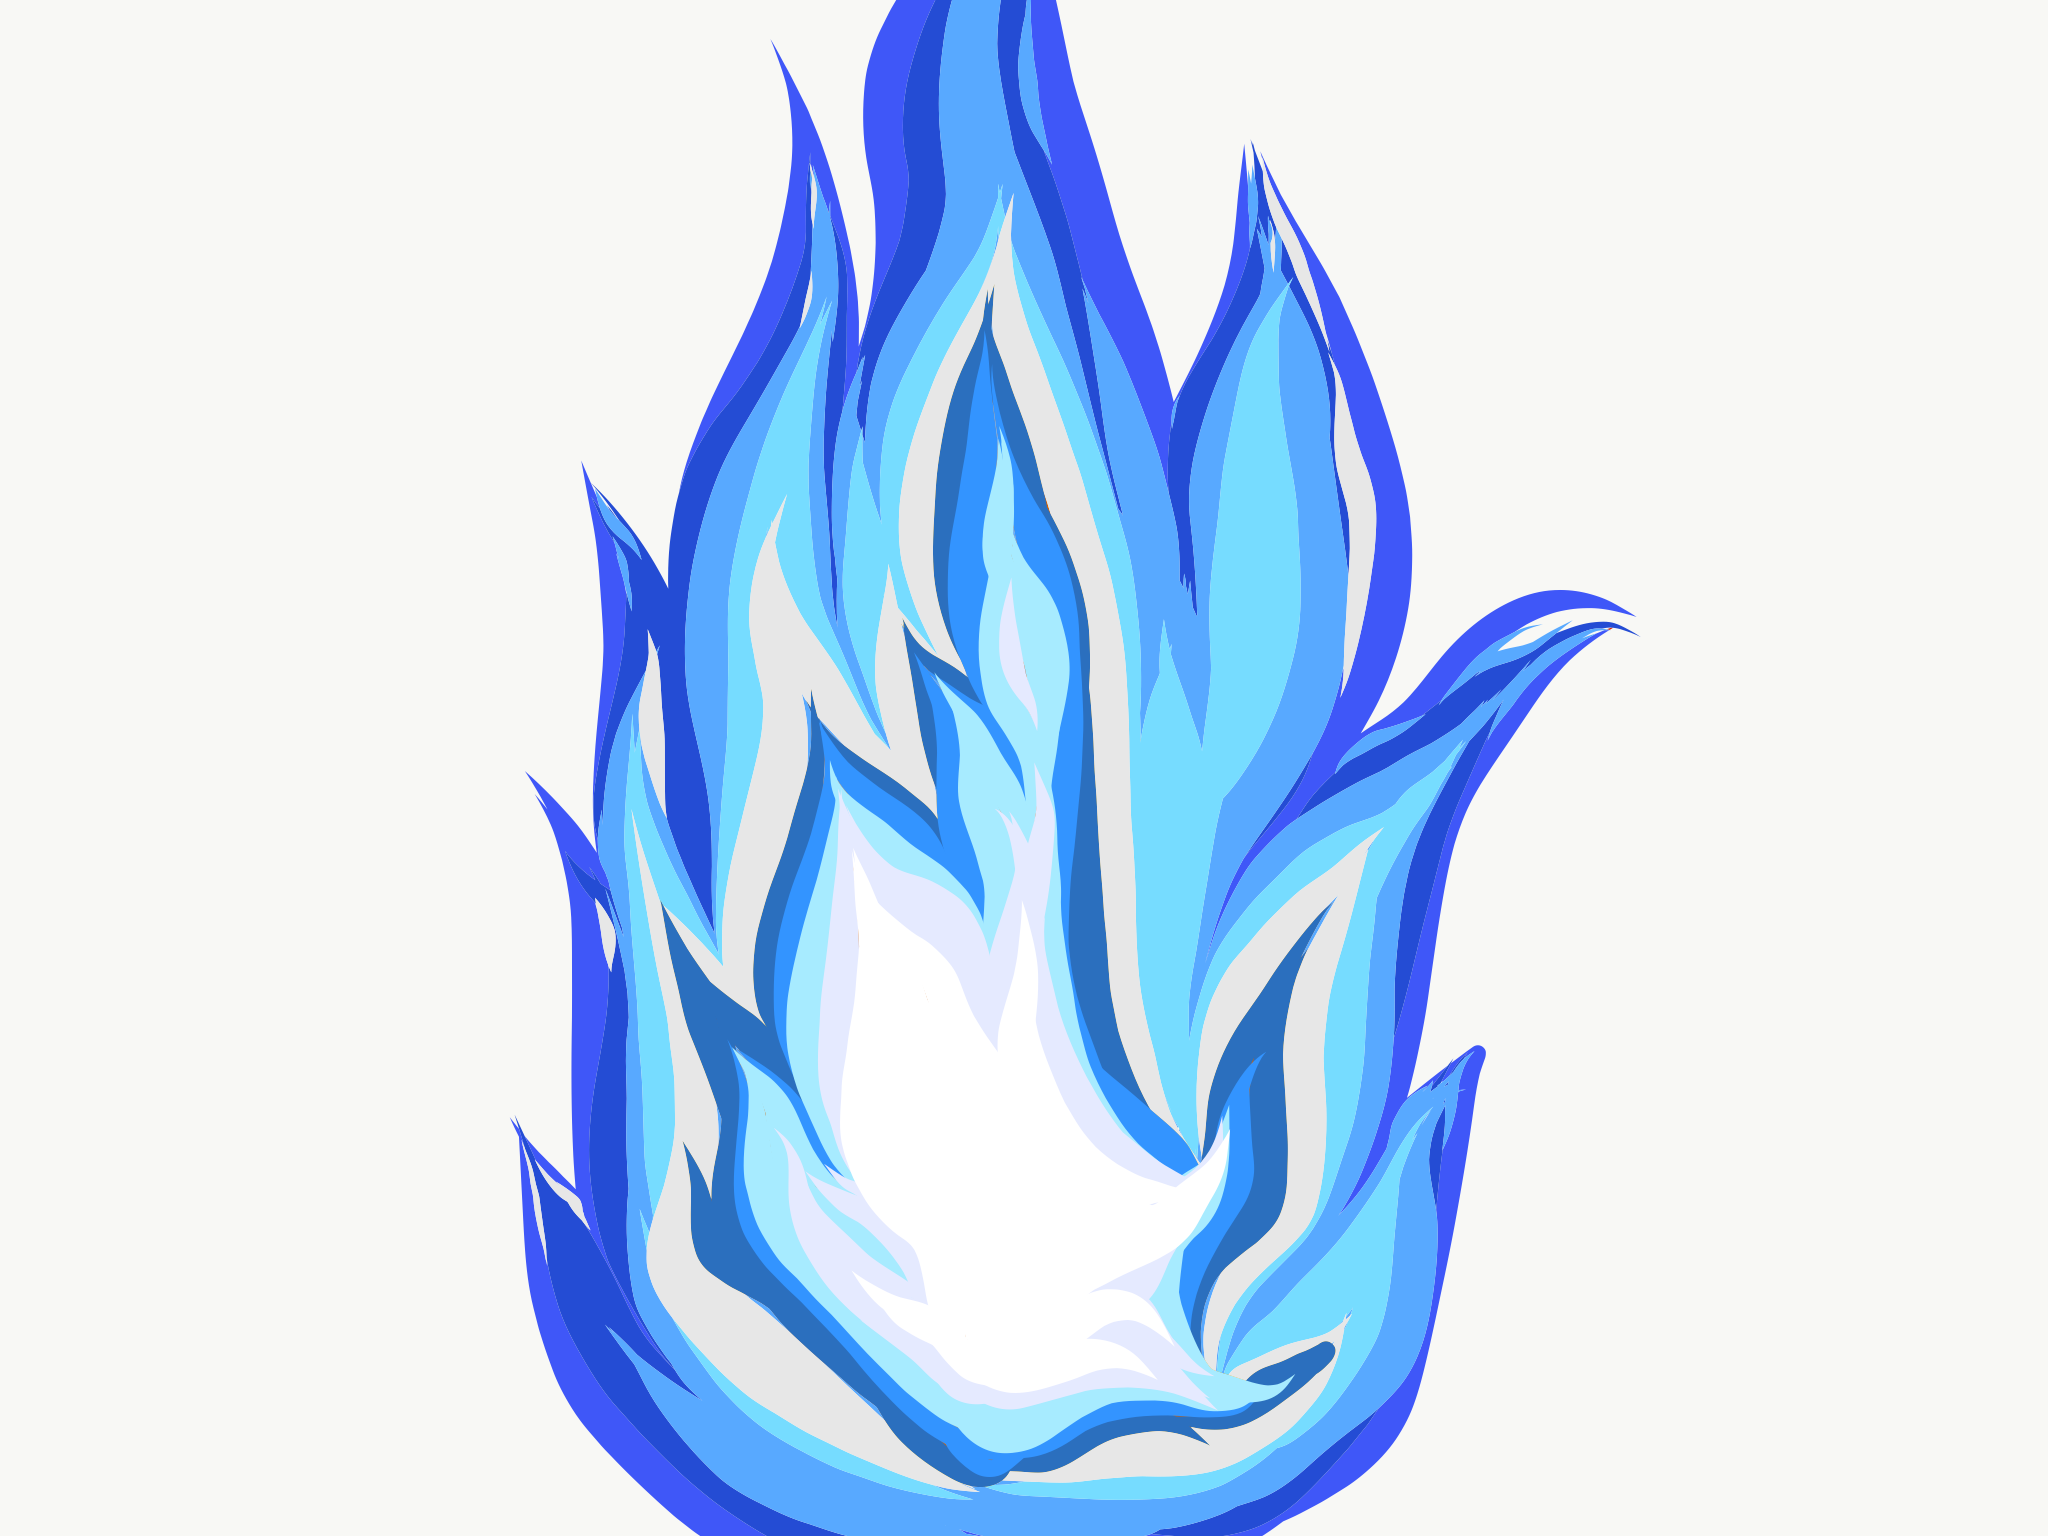 Blaue Flamme Temas Habilidades